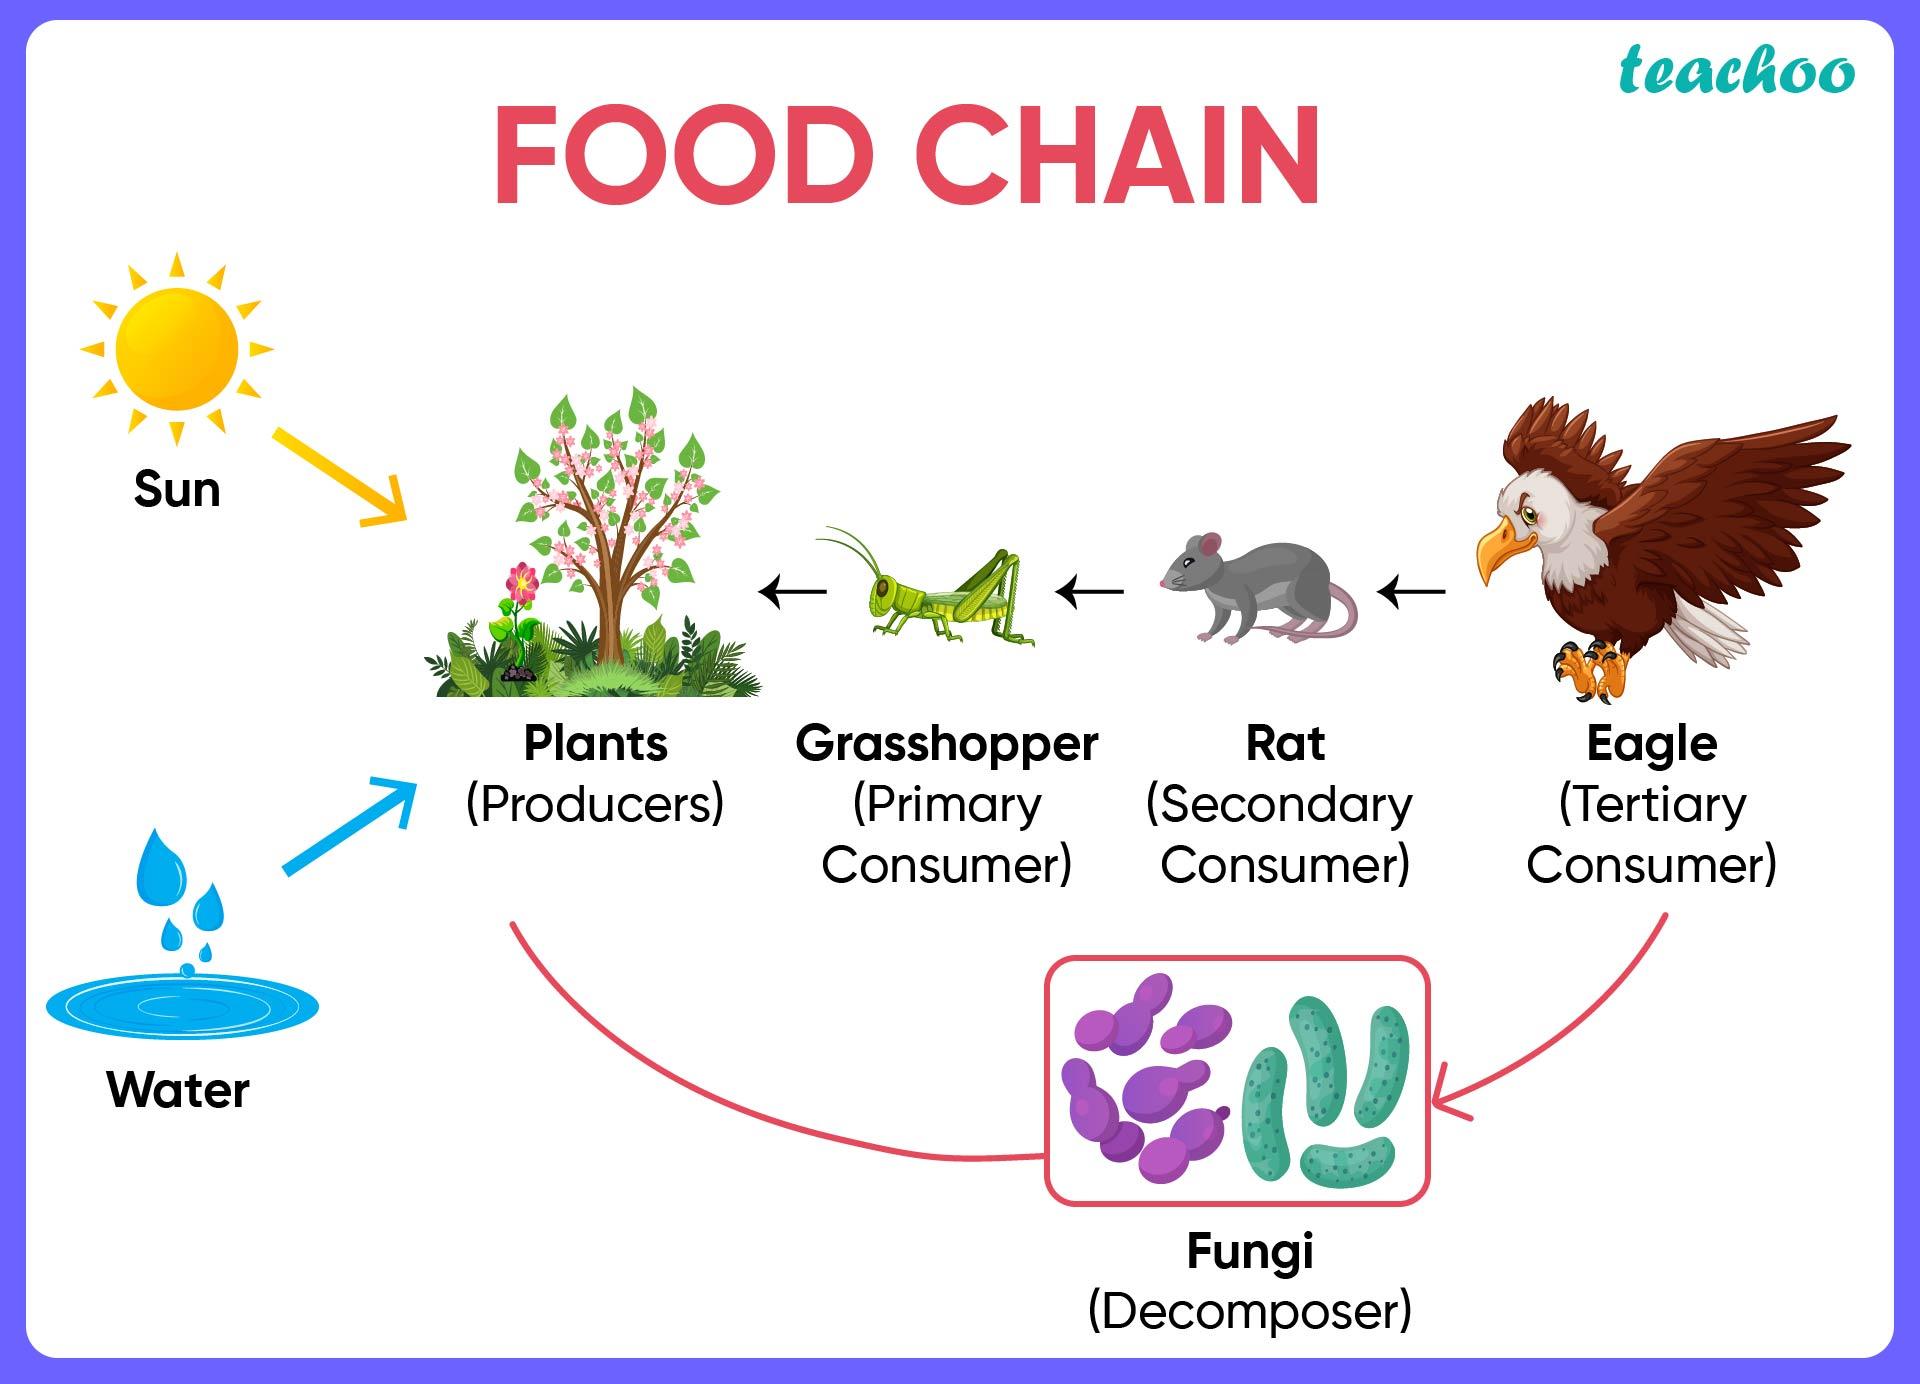 Food Chain-Teachoo-01.jpg